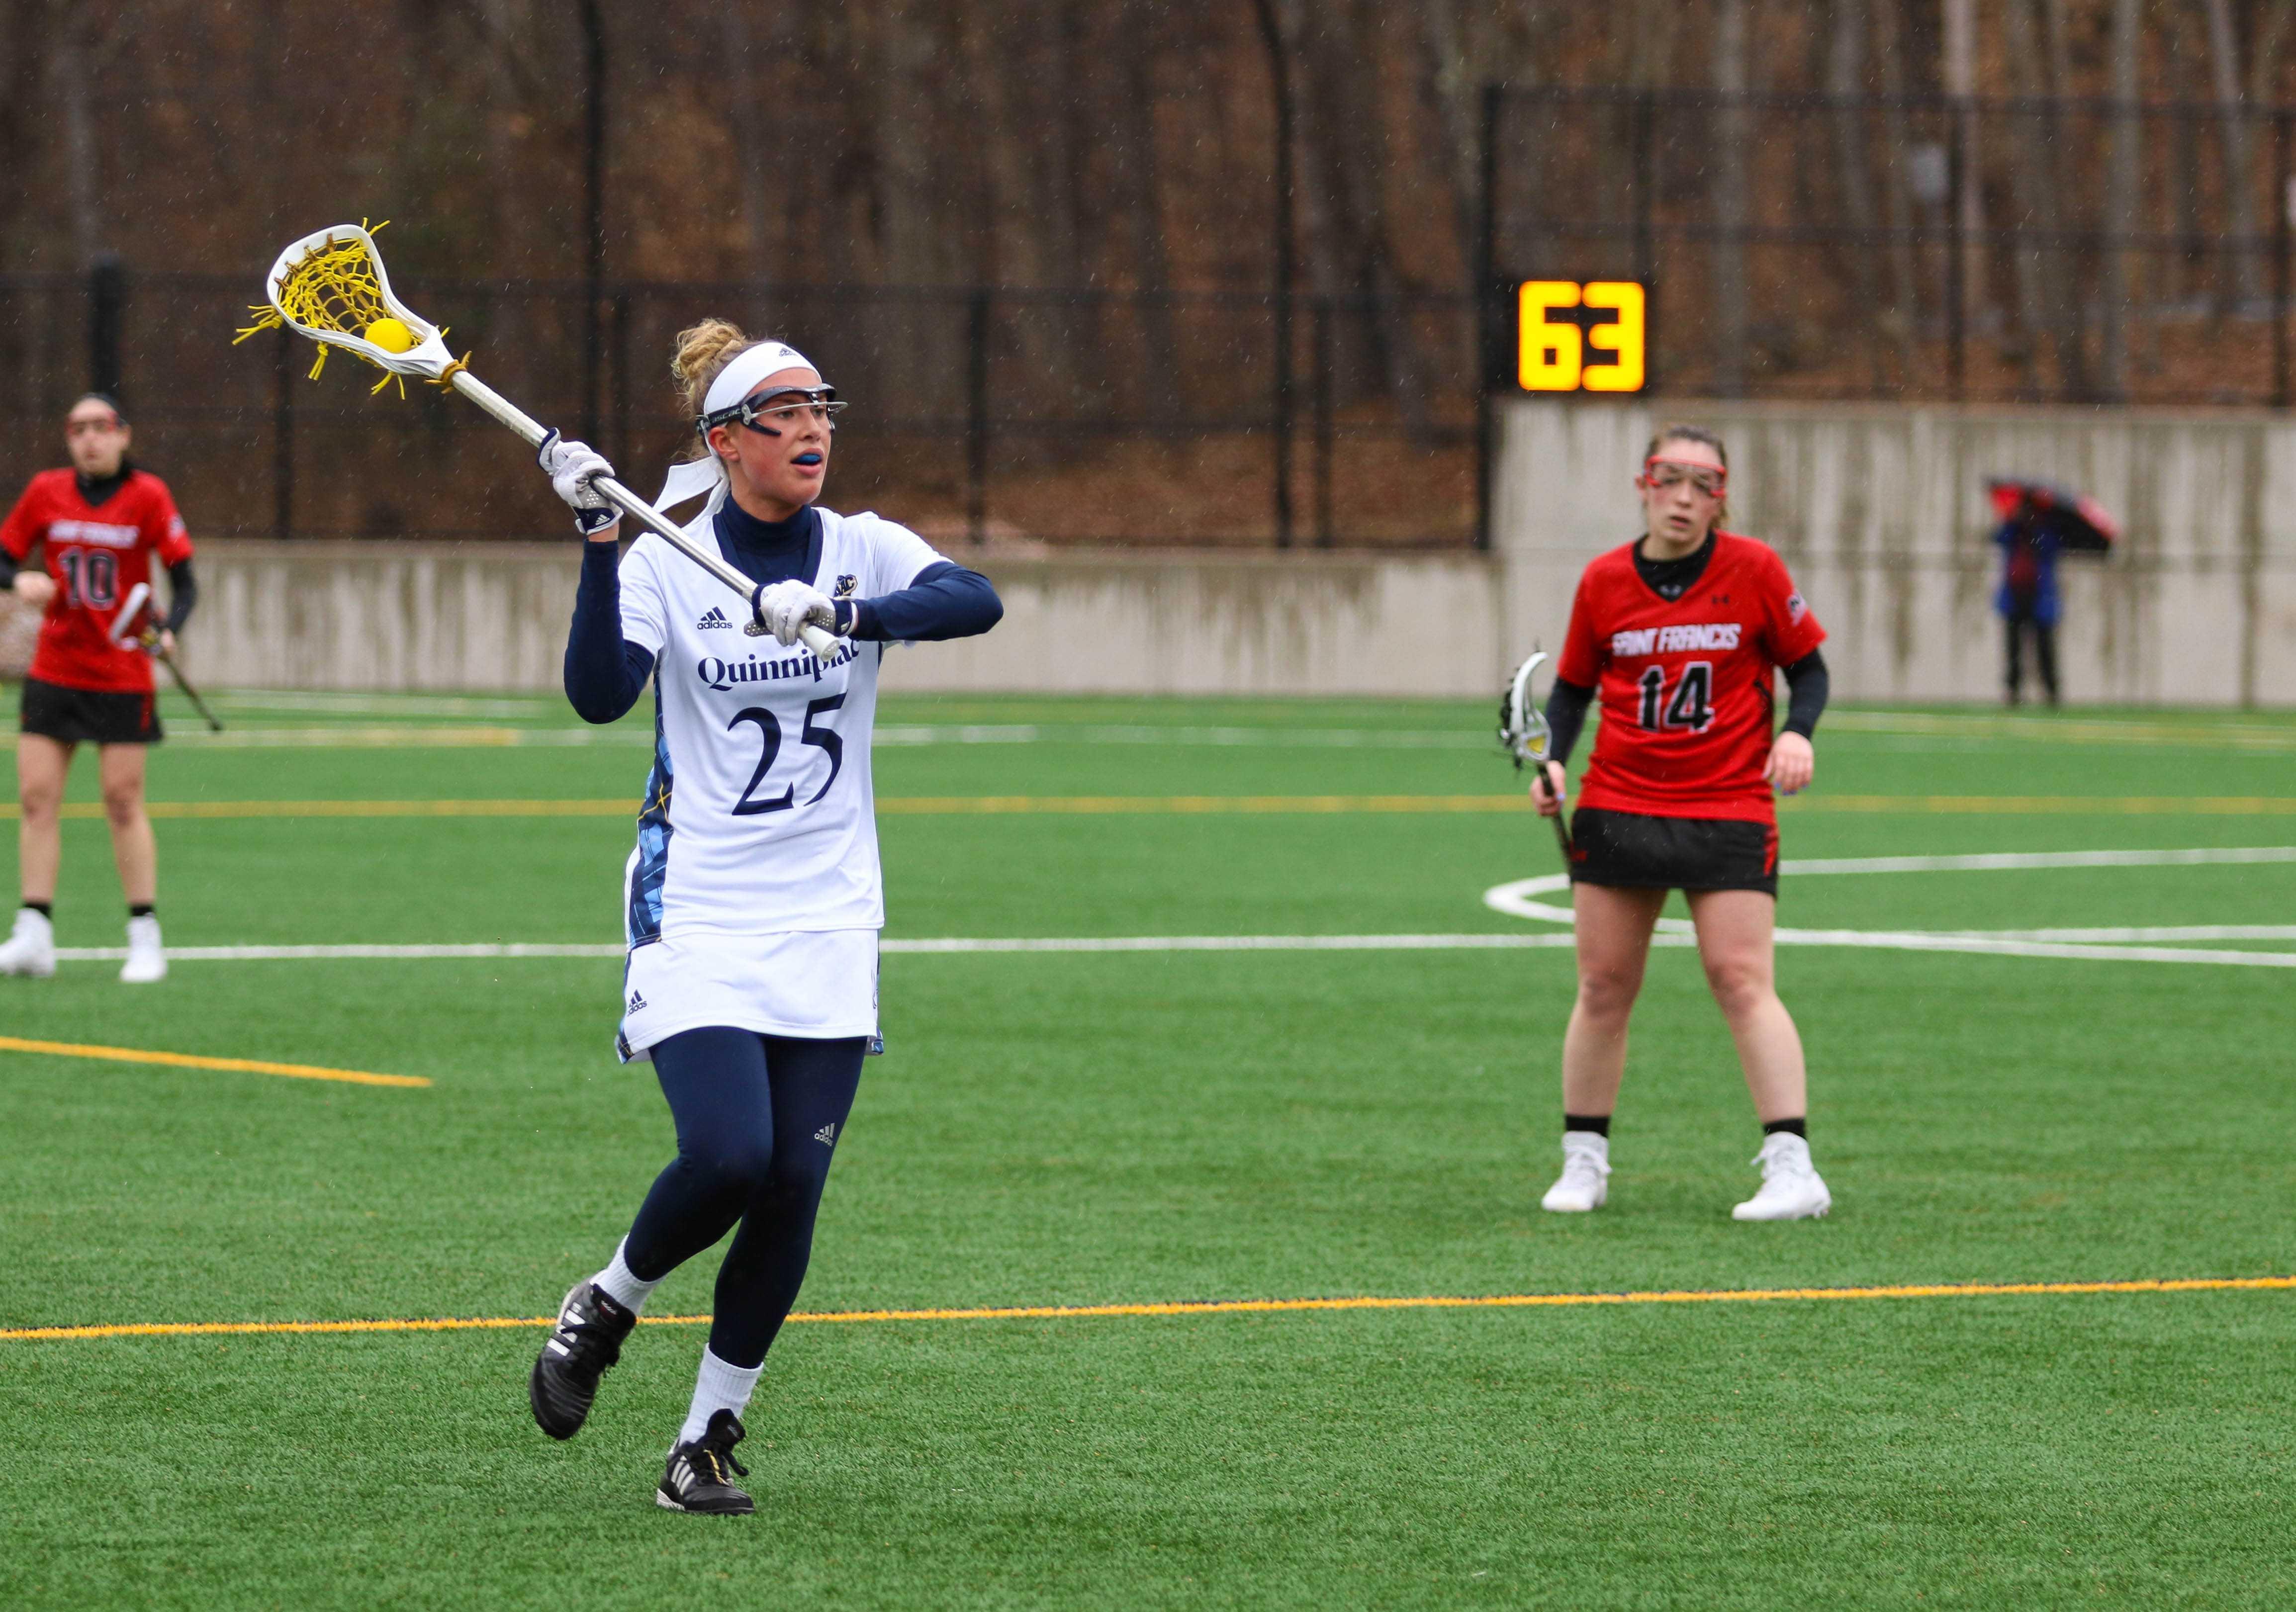 Quinnipiac women's lacrosse beats Sacred Heart, extends win streak to three